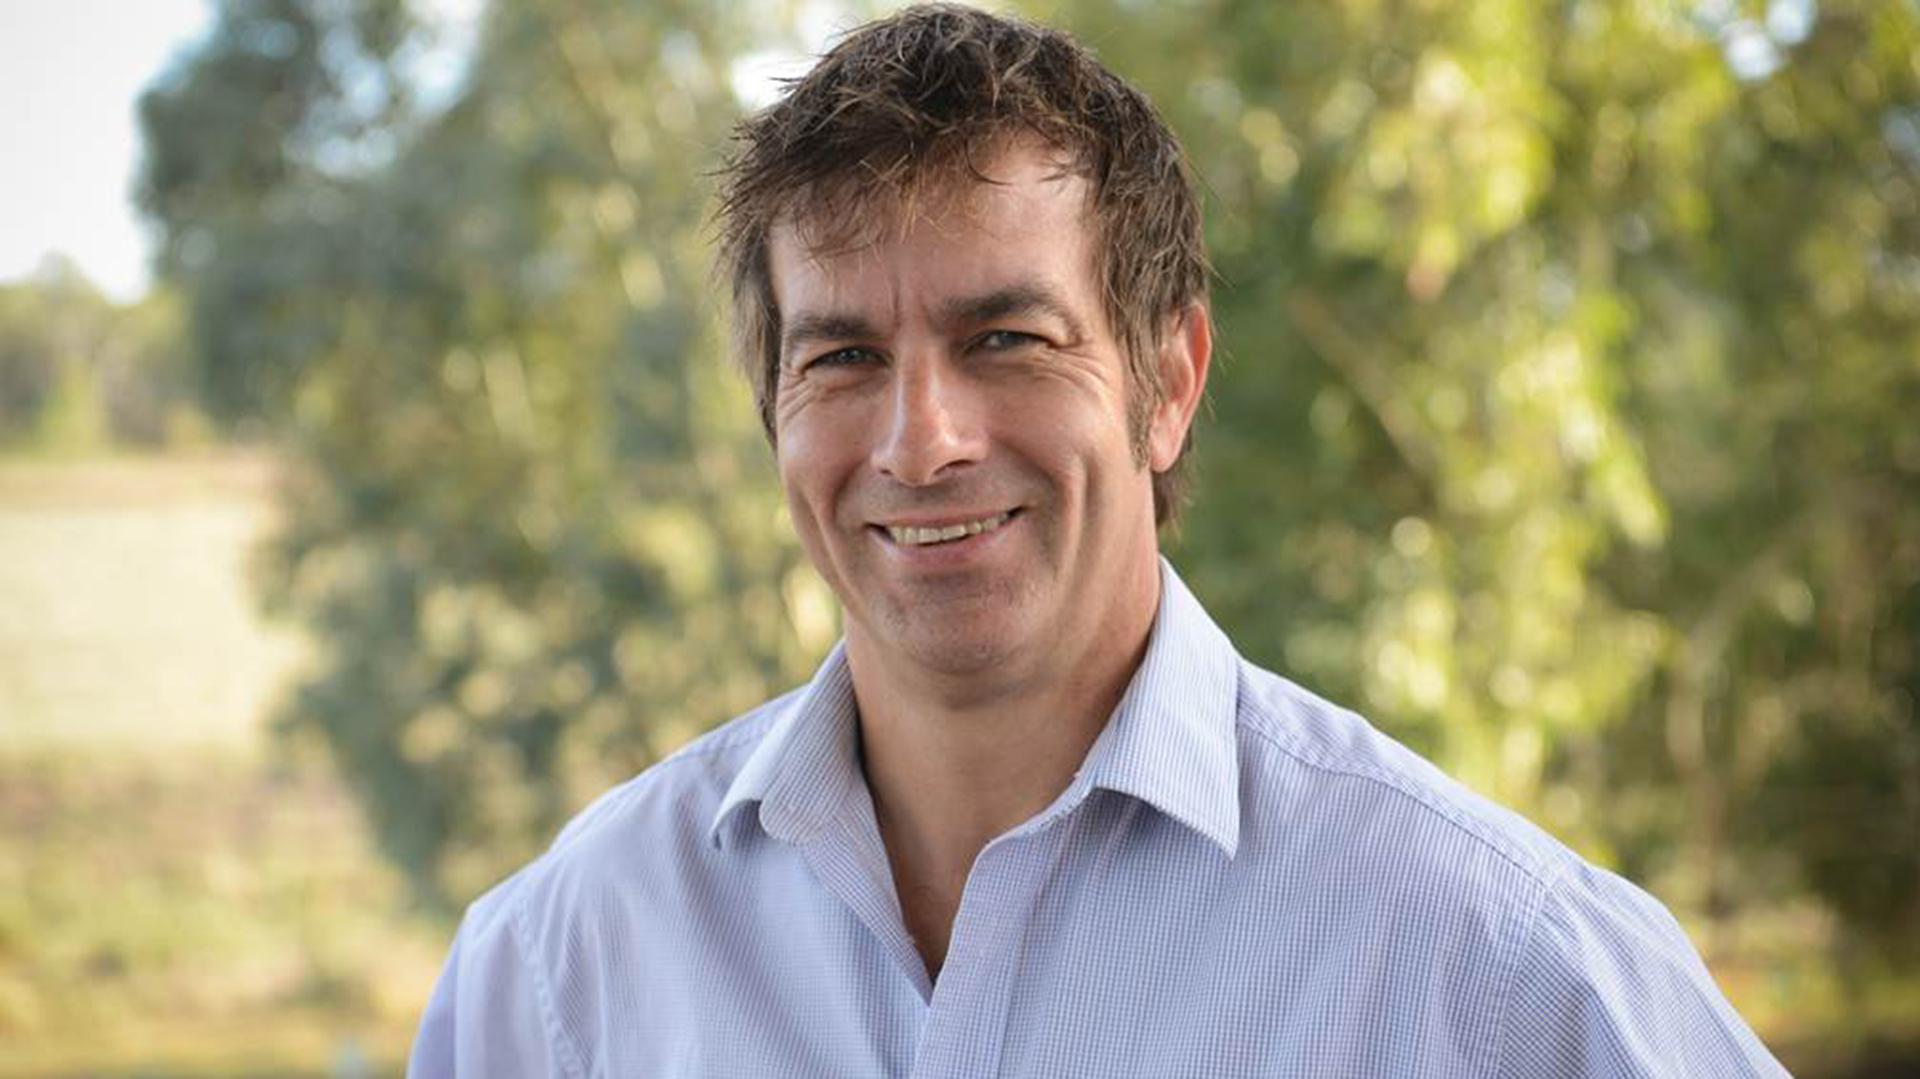 Professor Michael Friend